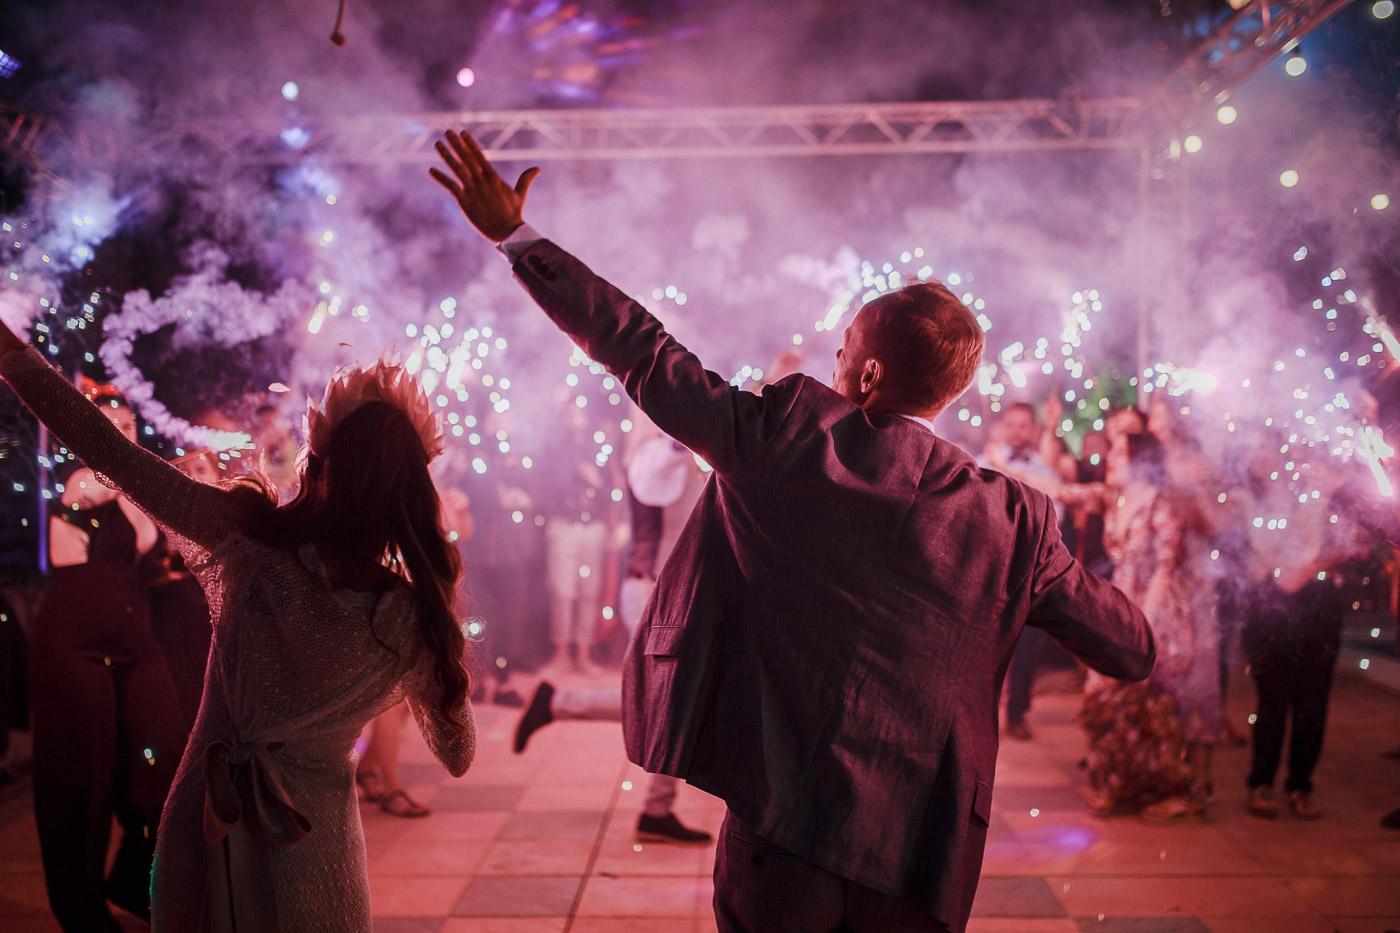 fiesta, sarao, boda, fenix visual, fiesta en boda, party, baile de boda,